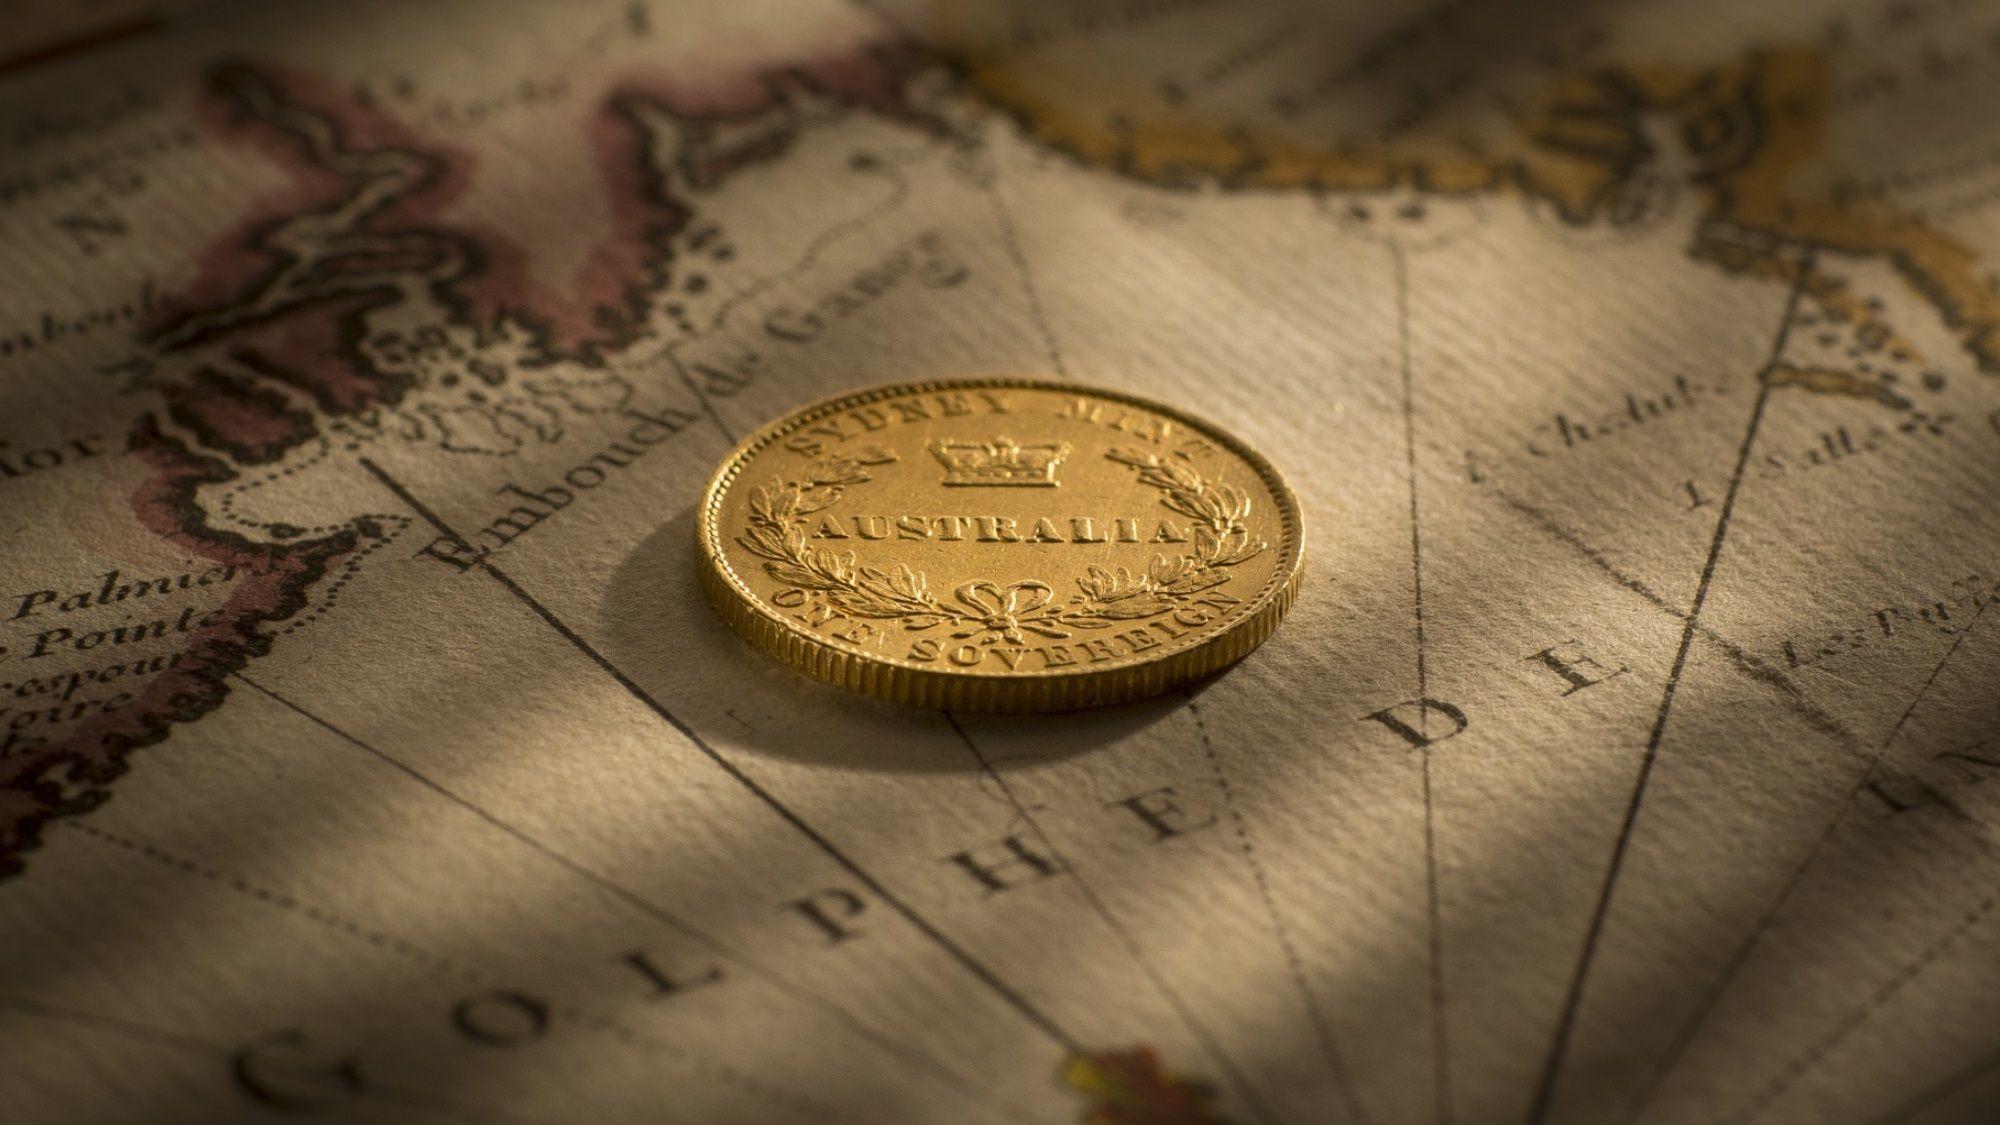 1855 Sydney Mint Sovereign EF rev B&B May 2018